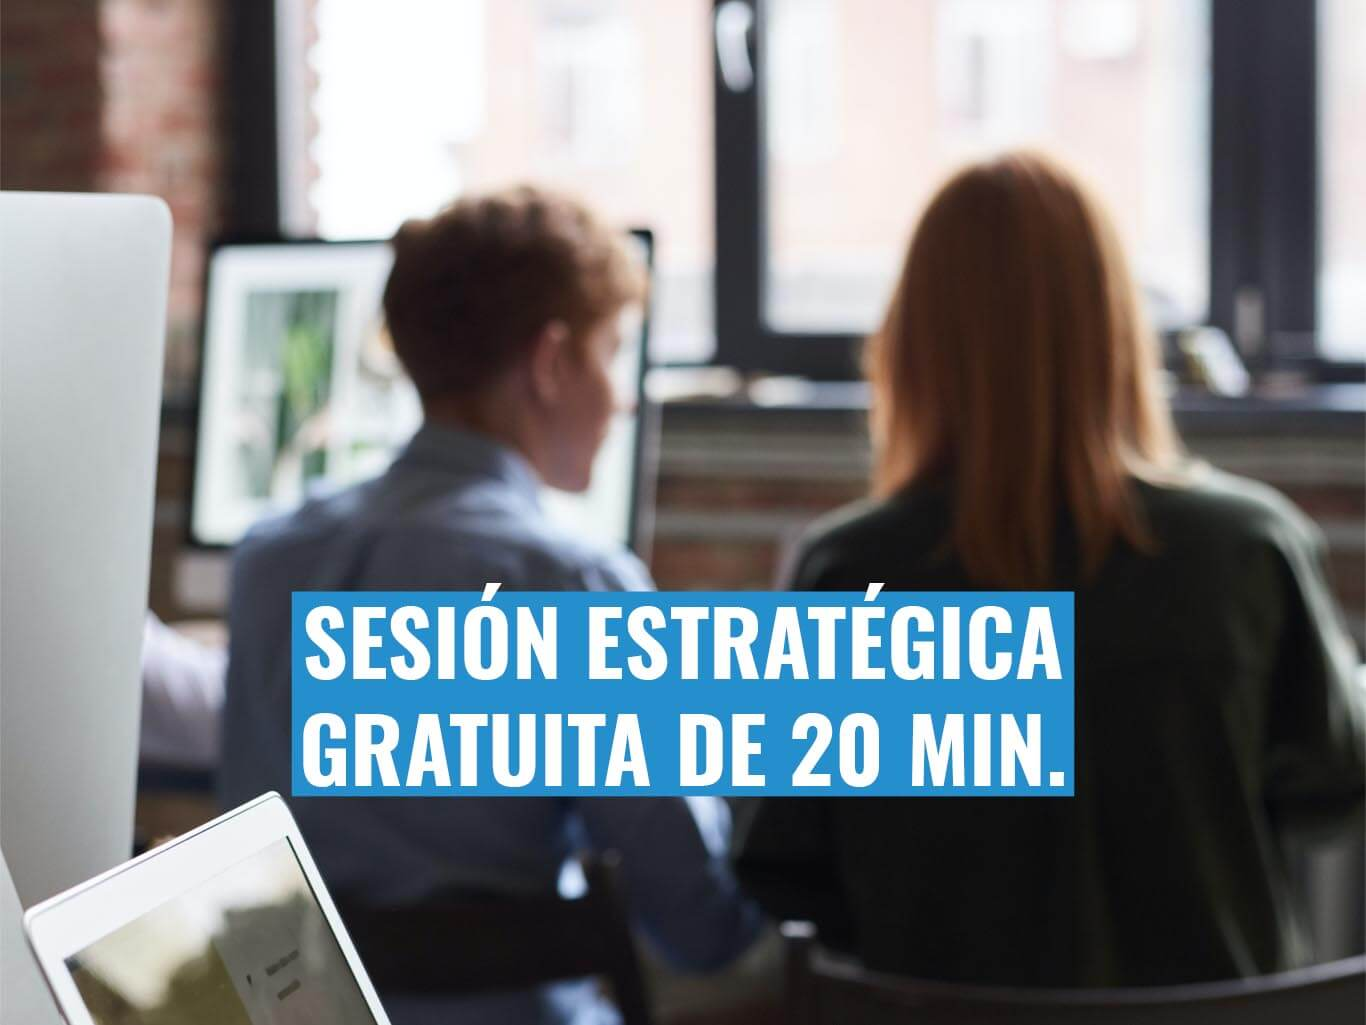 SESION ESTRATEGICA GRATUITA